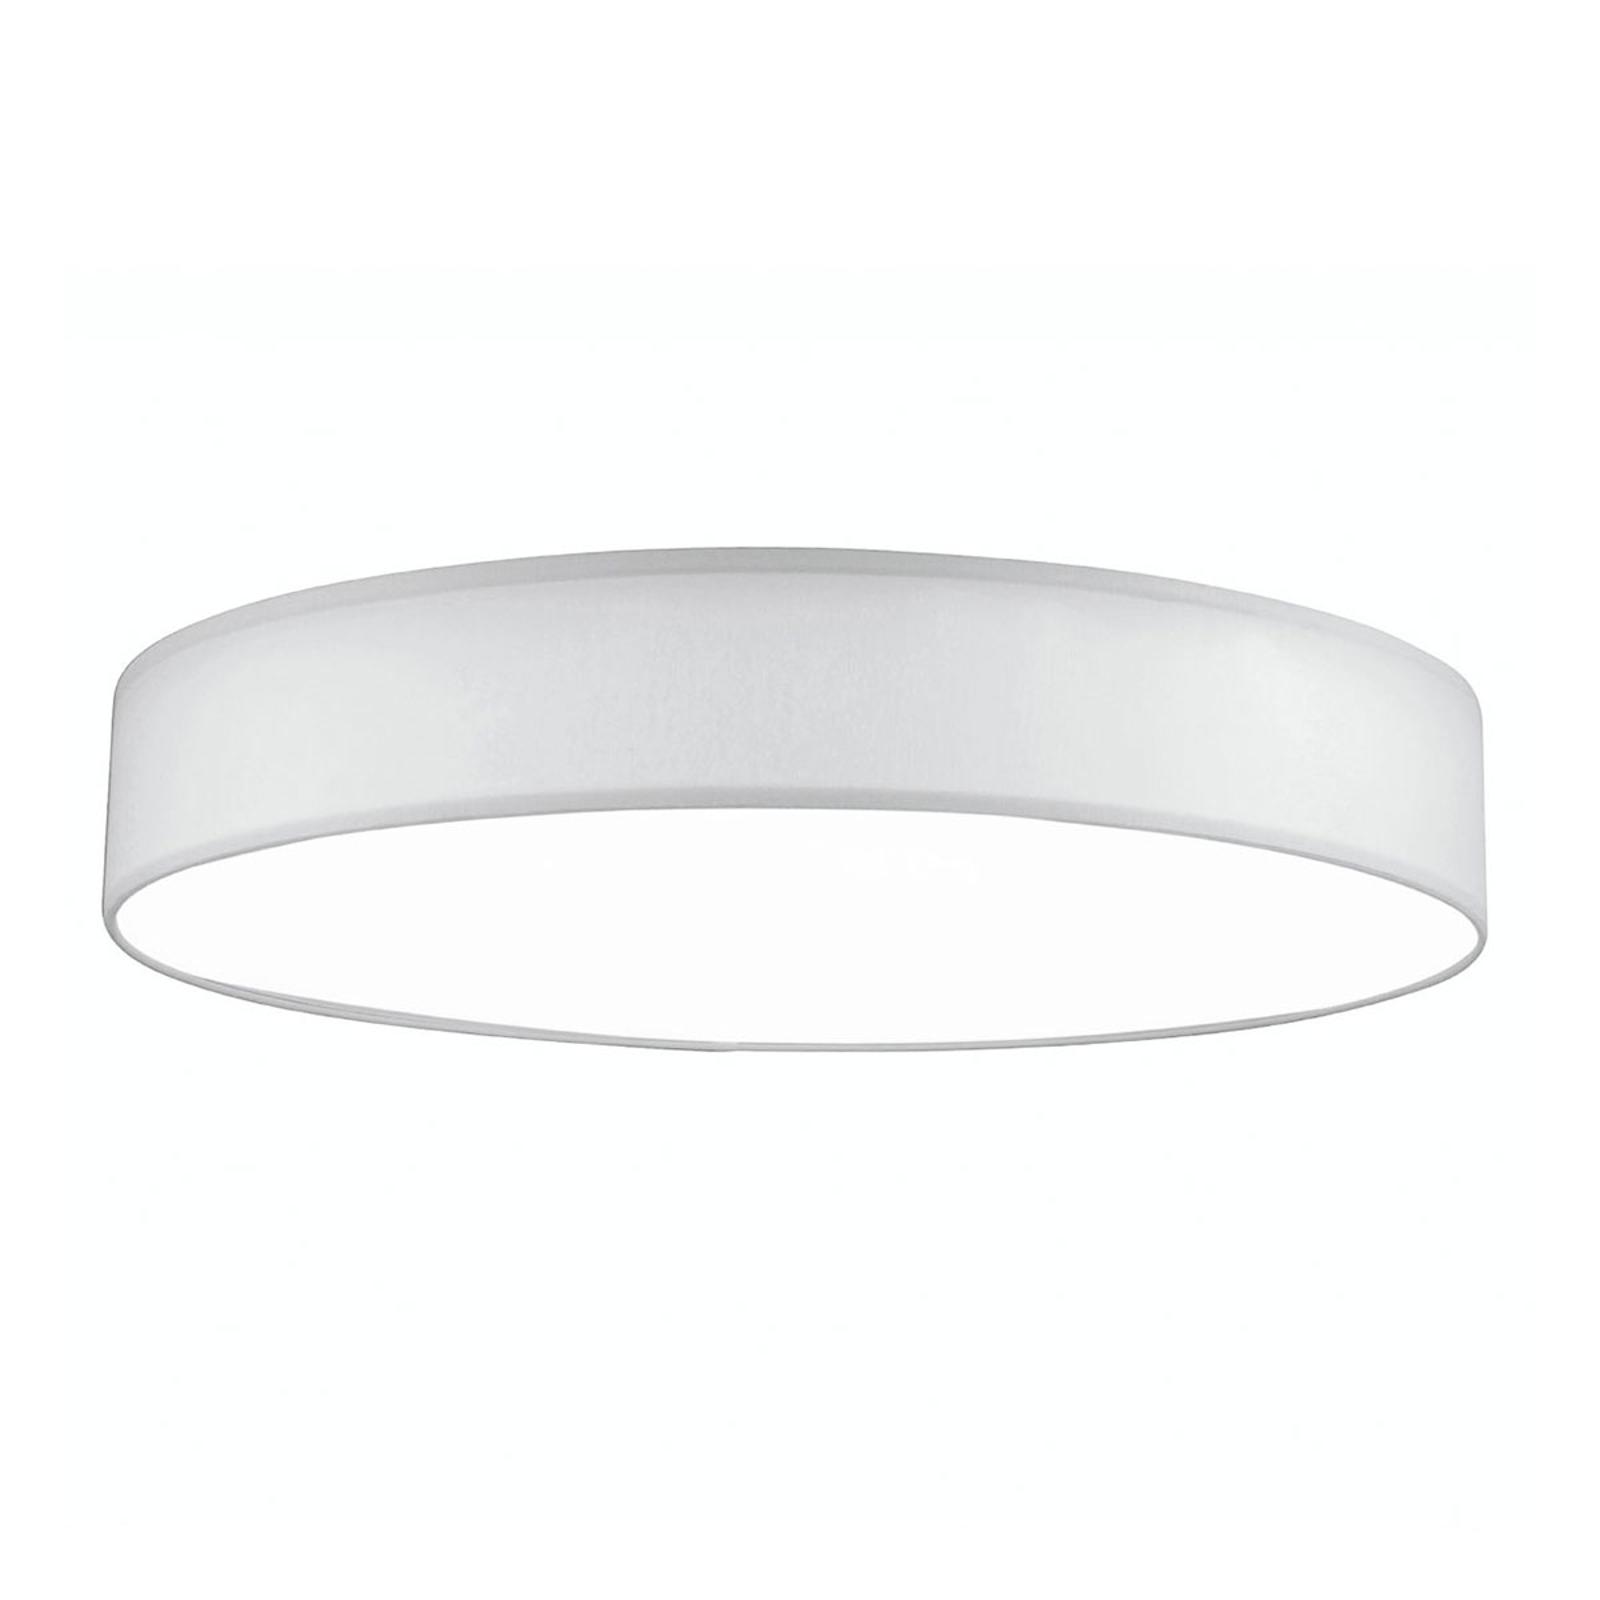 LED-taklampe Luno XL, 3000K, 60 W, hvit